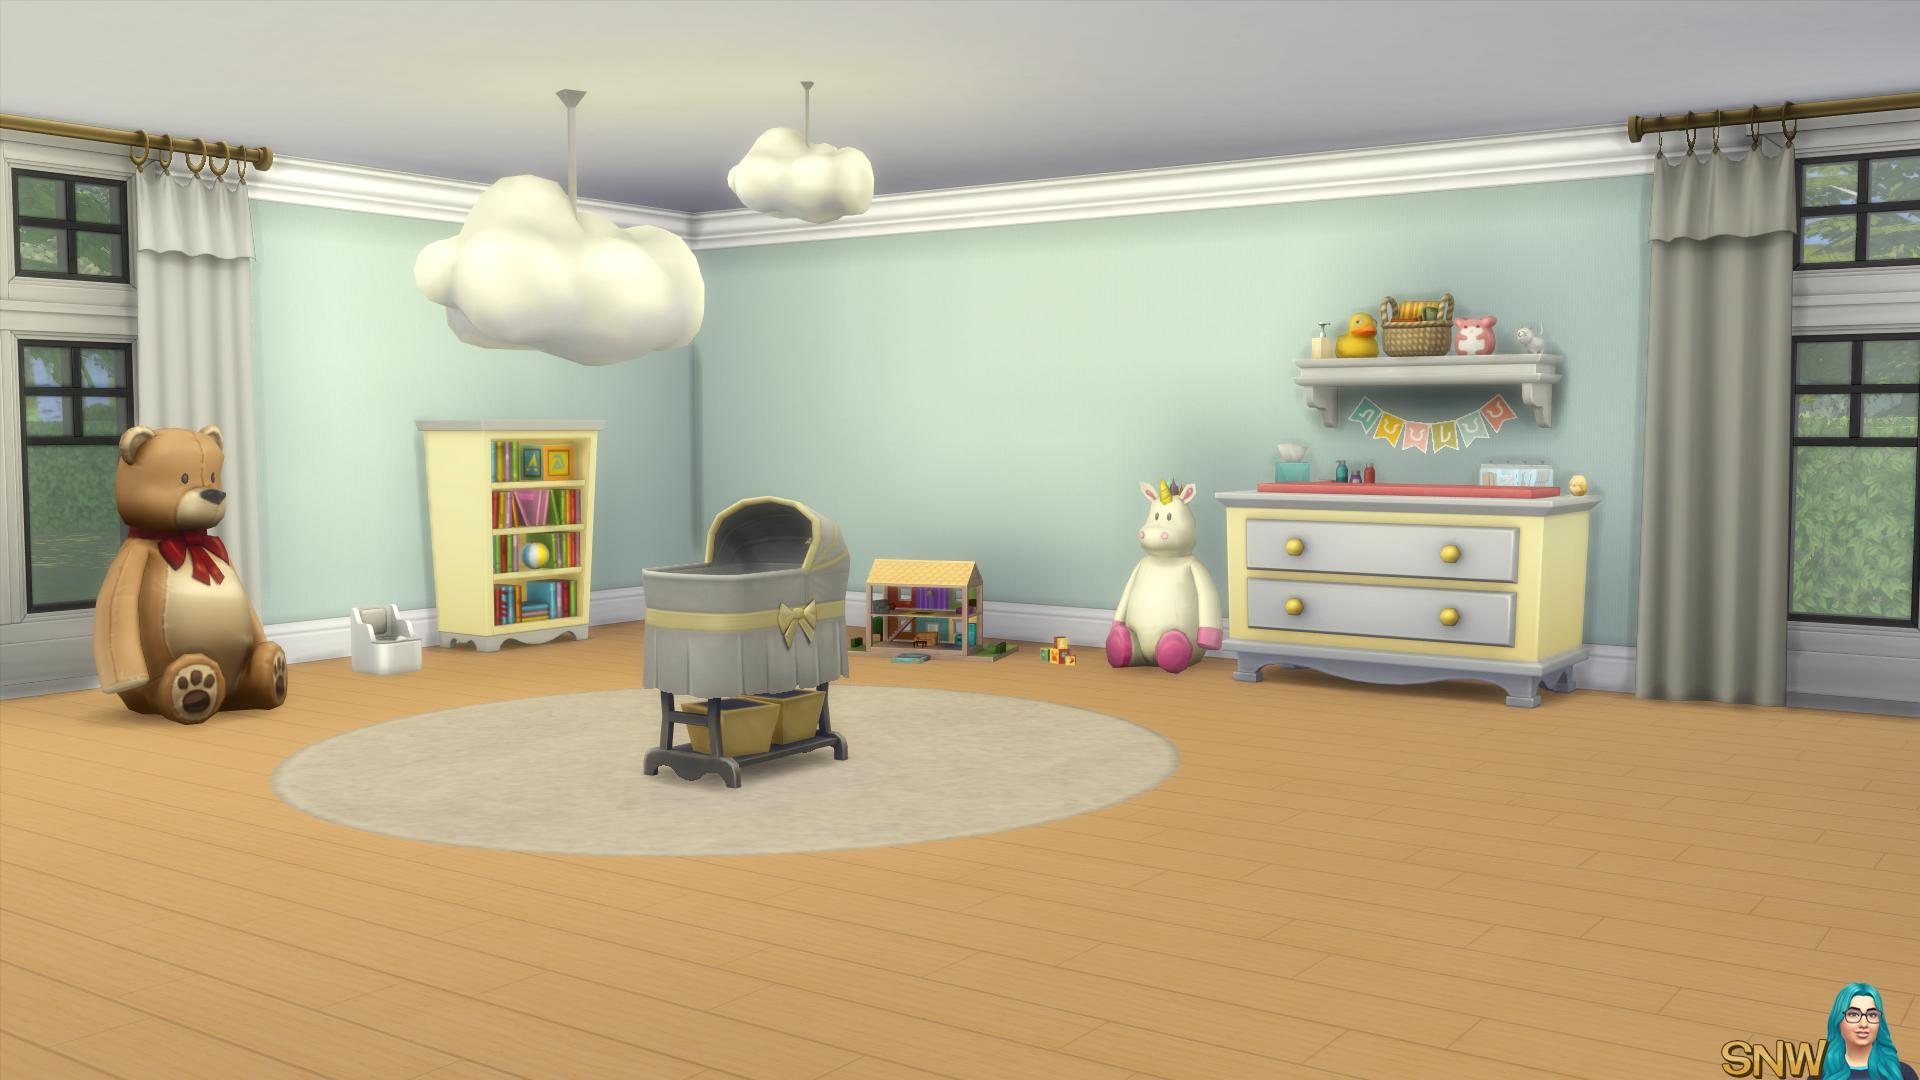 Nursery Walls Set #1 - Basics + Triangles